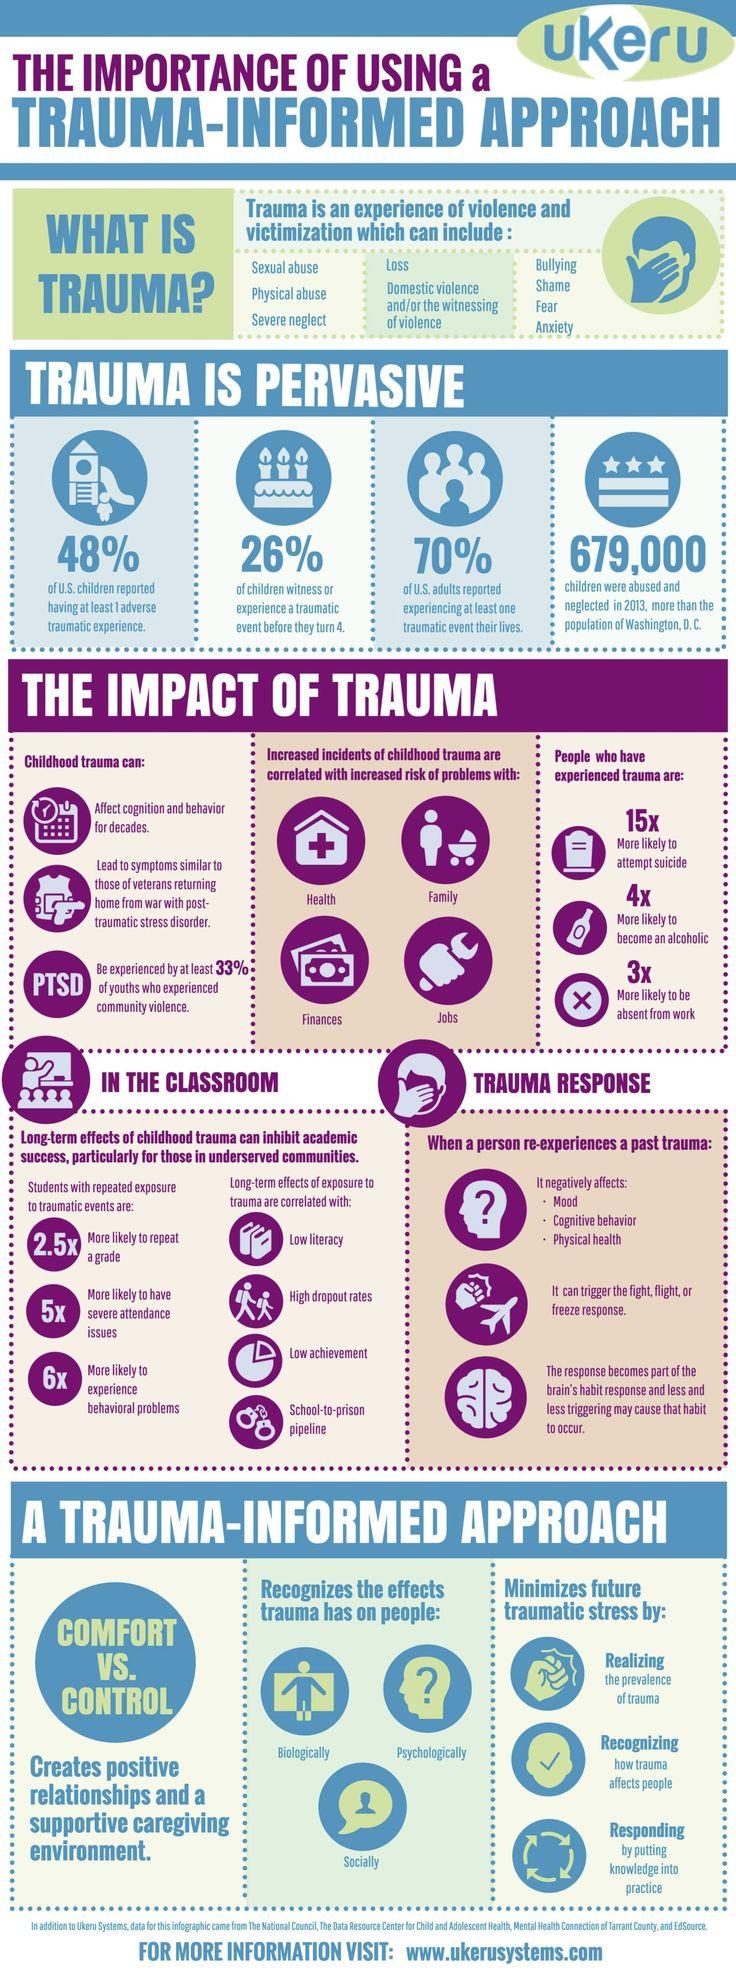 The Importance of Using a Trauma-Informed Approach – ukeru – Amy Florence